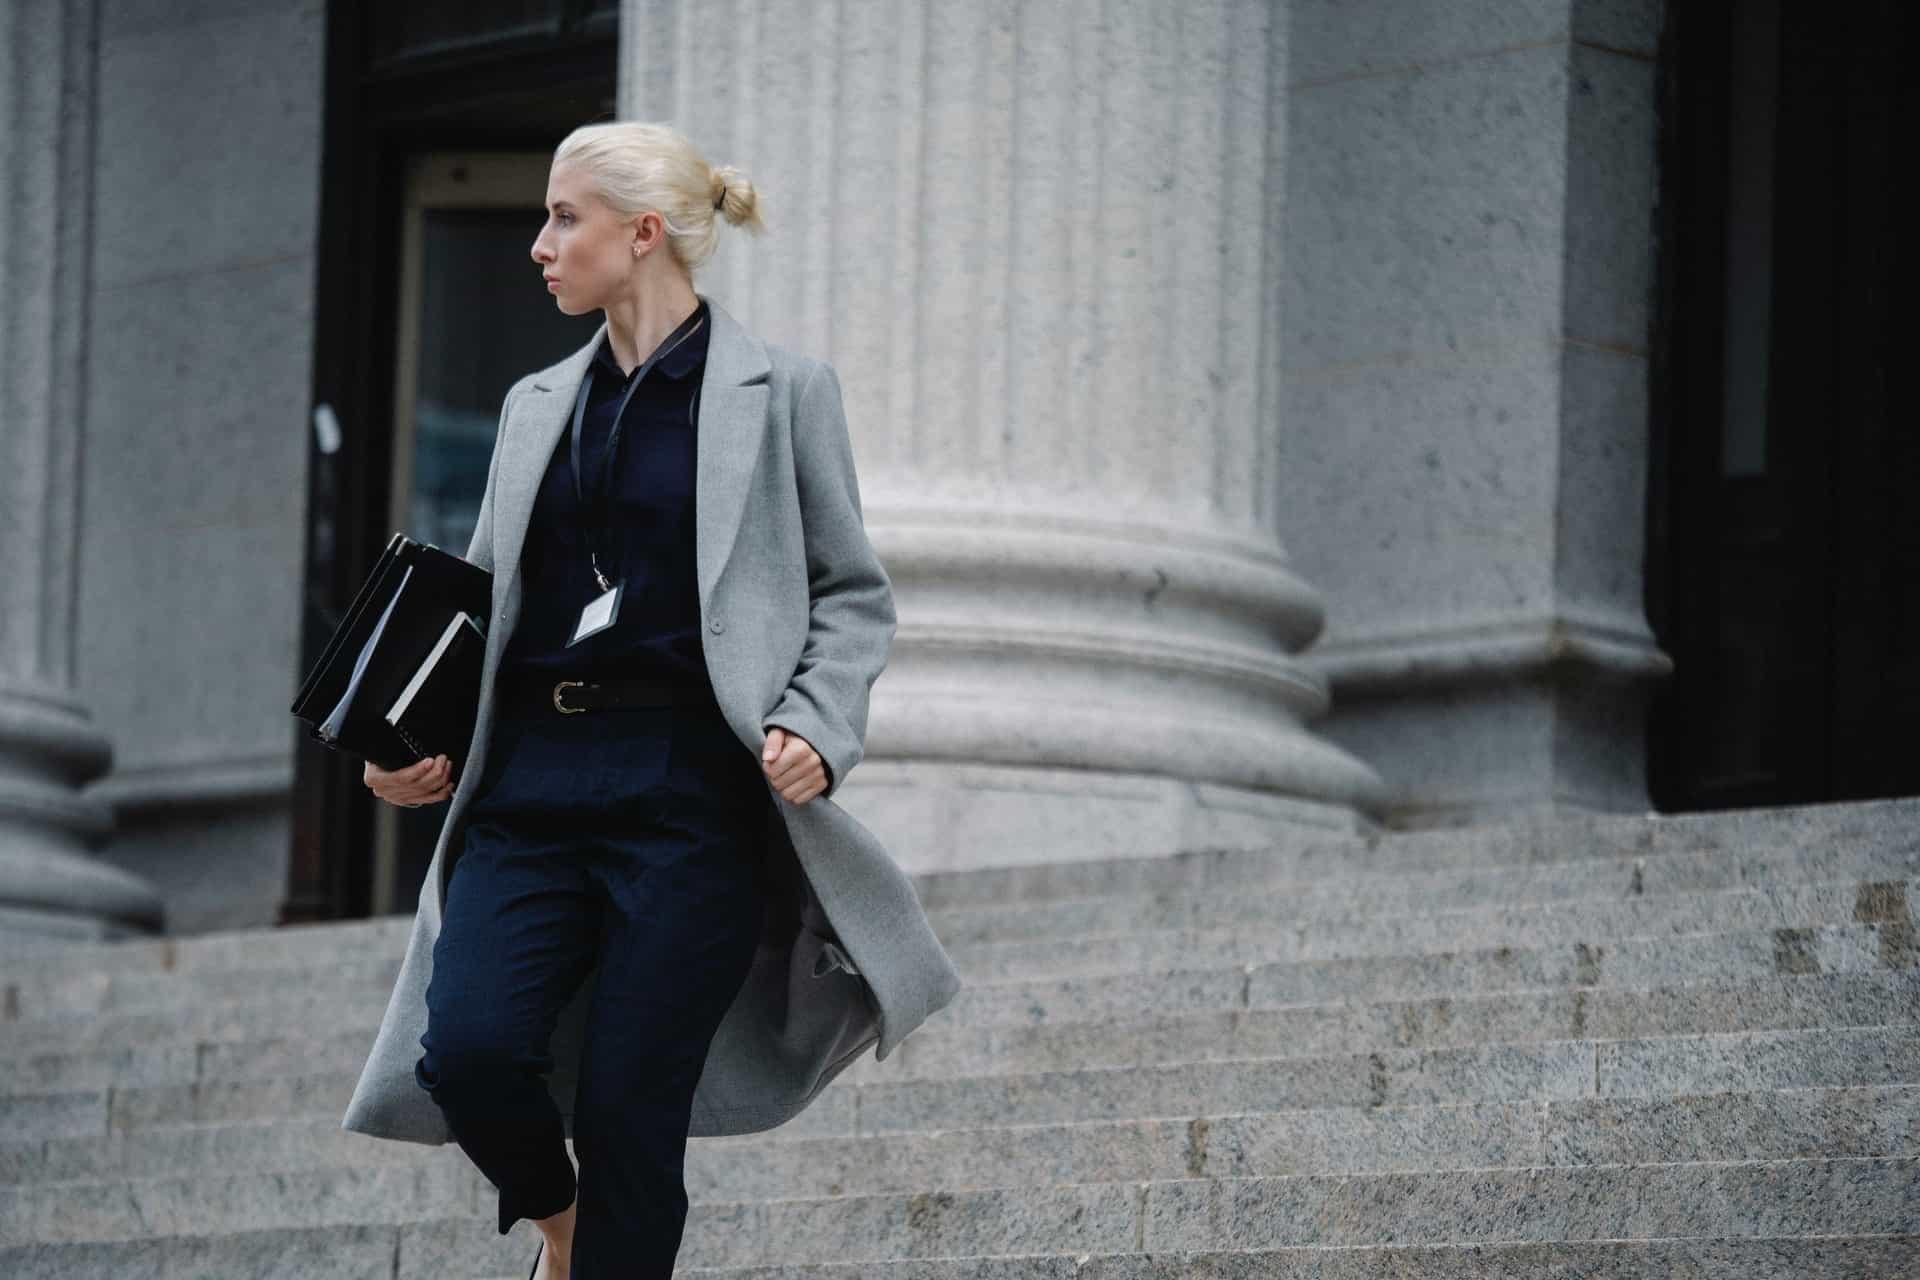 Lawyer walking